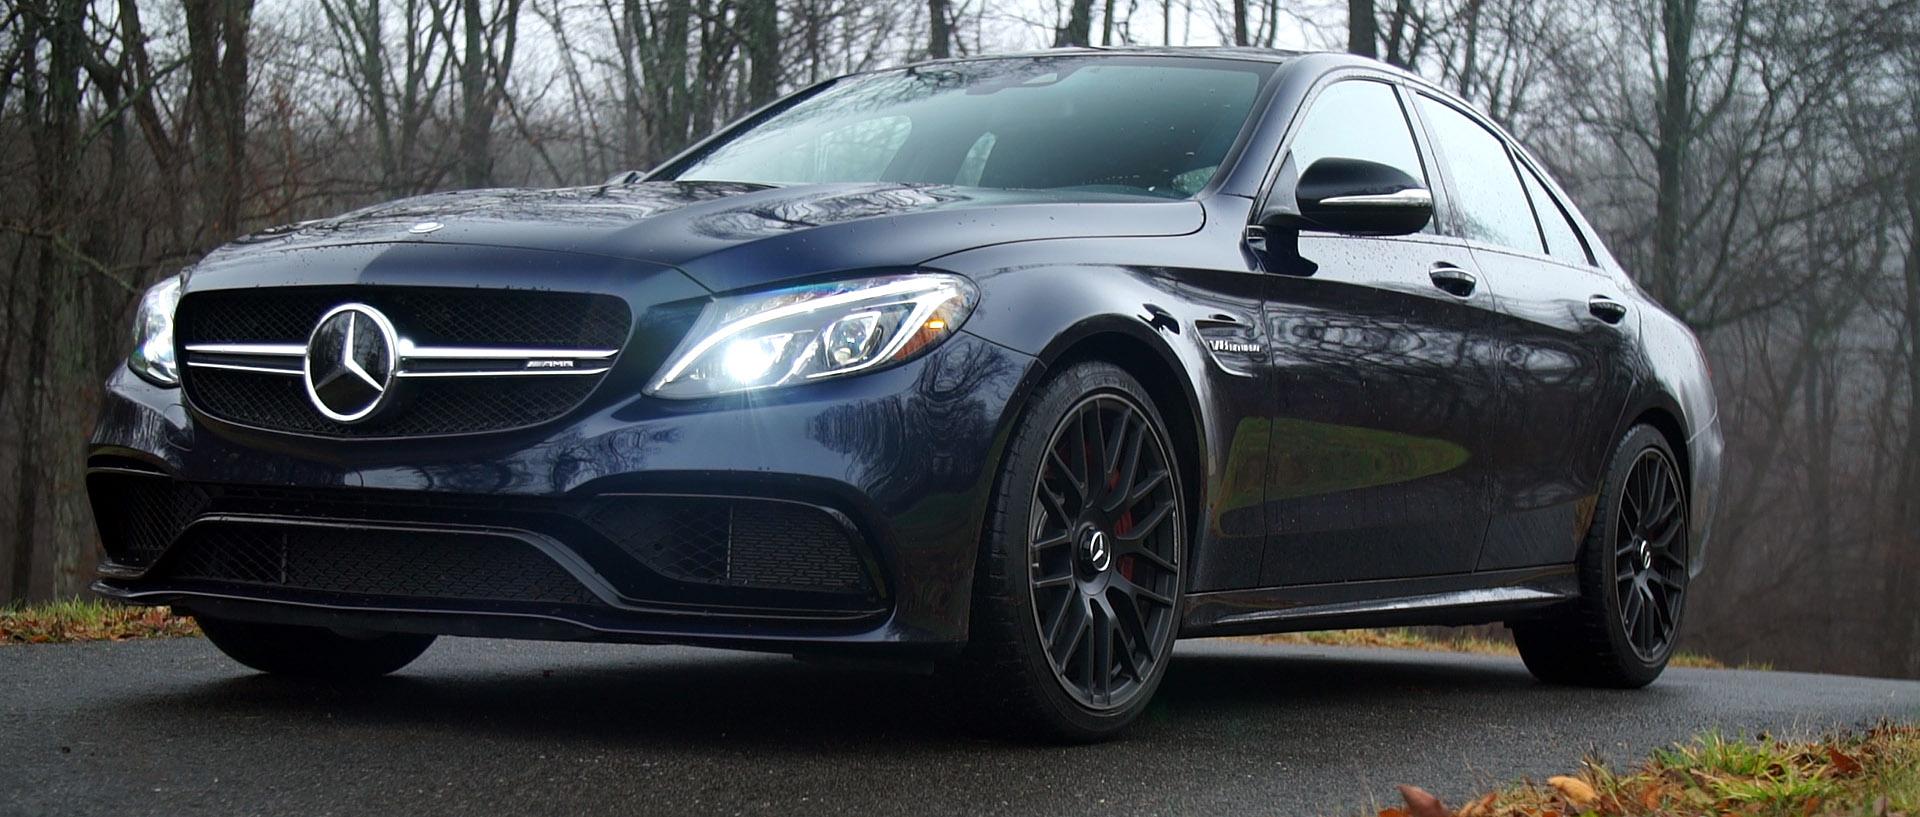 2016 mercedes benz amg c63 s impresses consumer reports for Mercedes benz c300 consumer reports